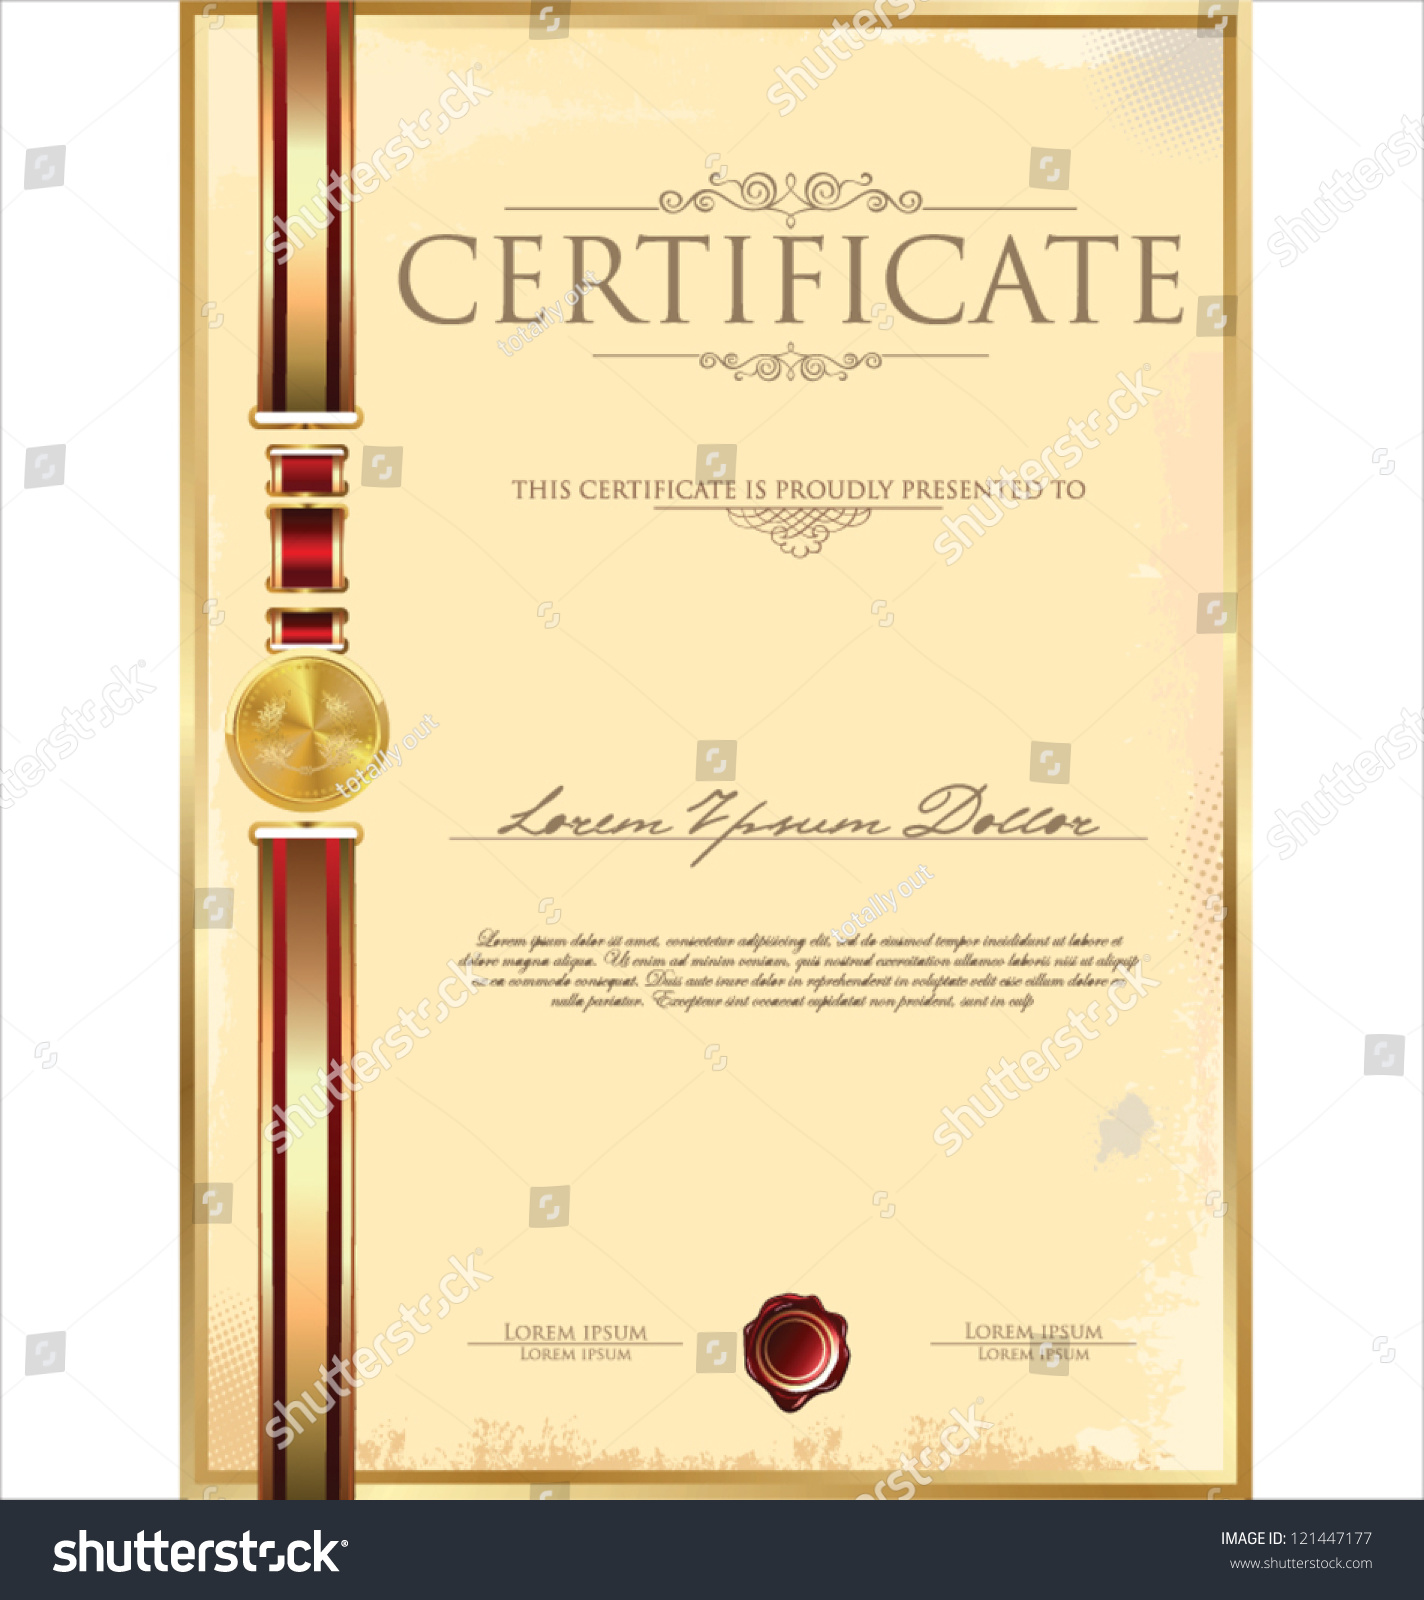 certificate template stock vector 121447177 shutterstock certificate template